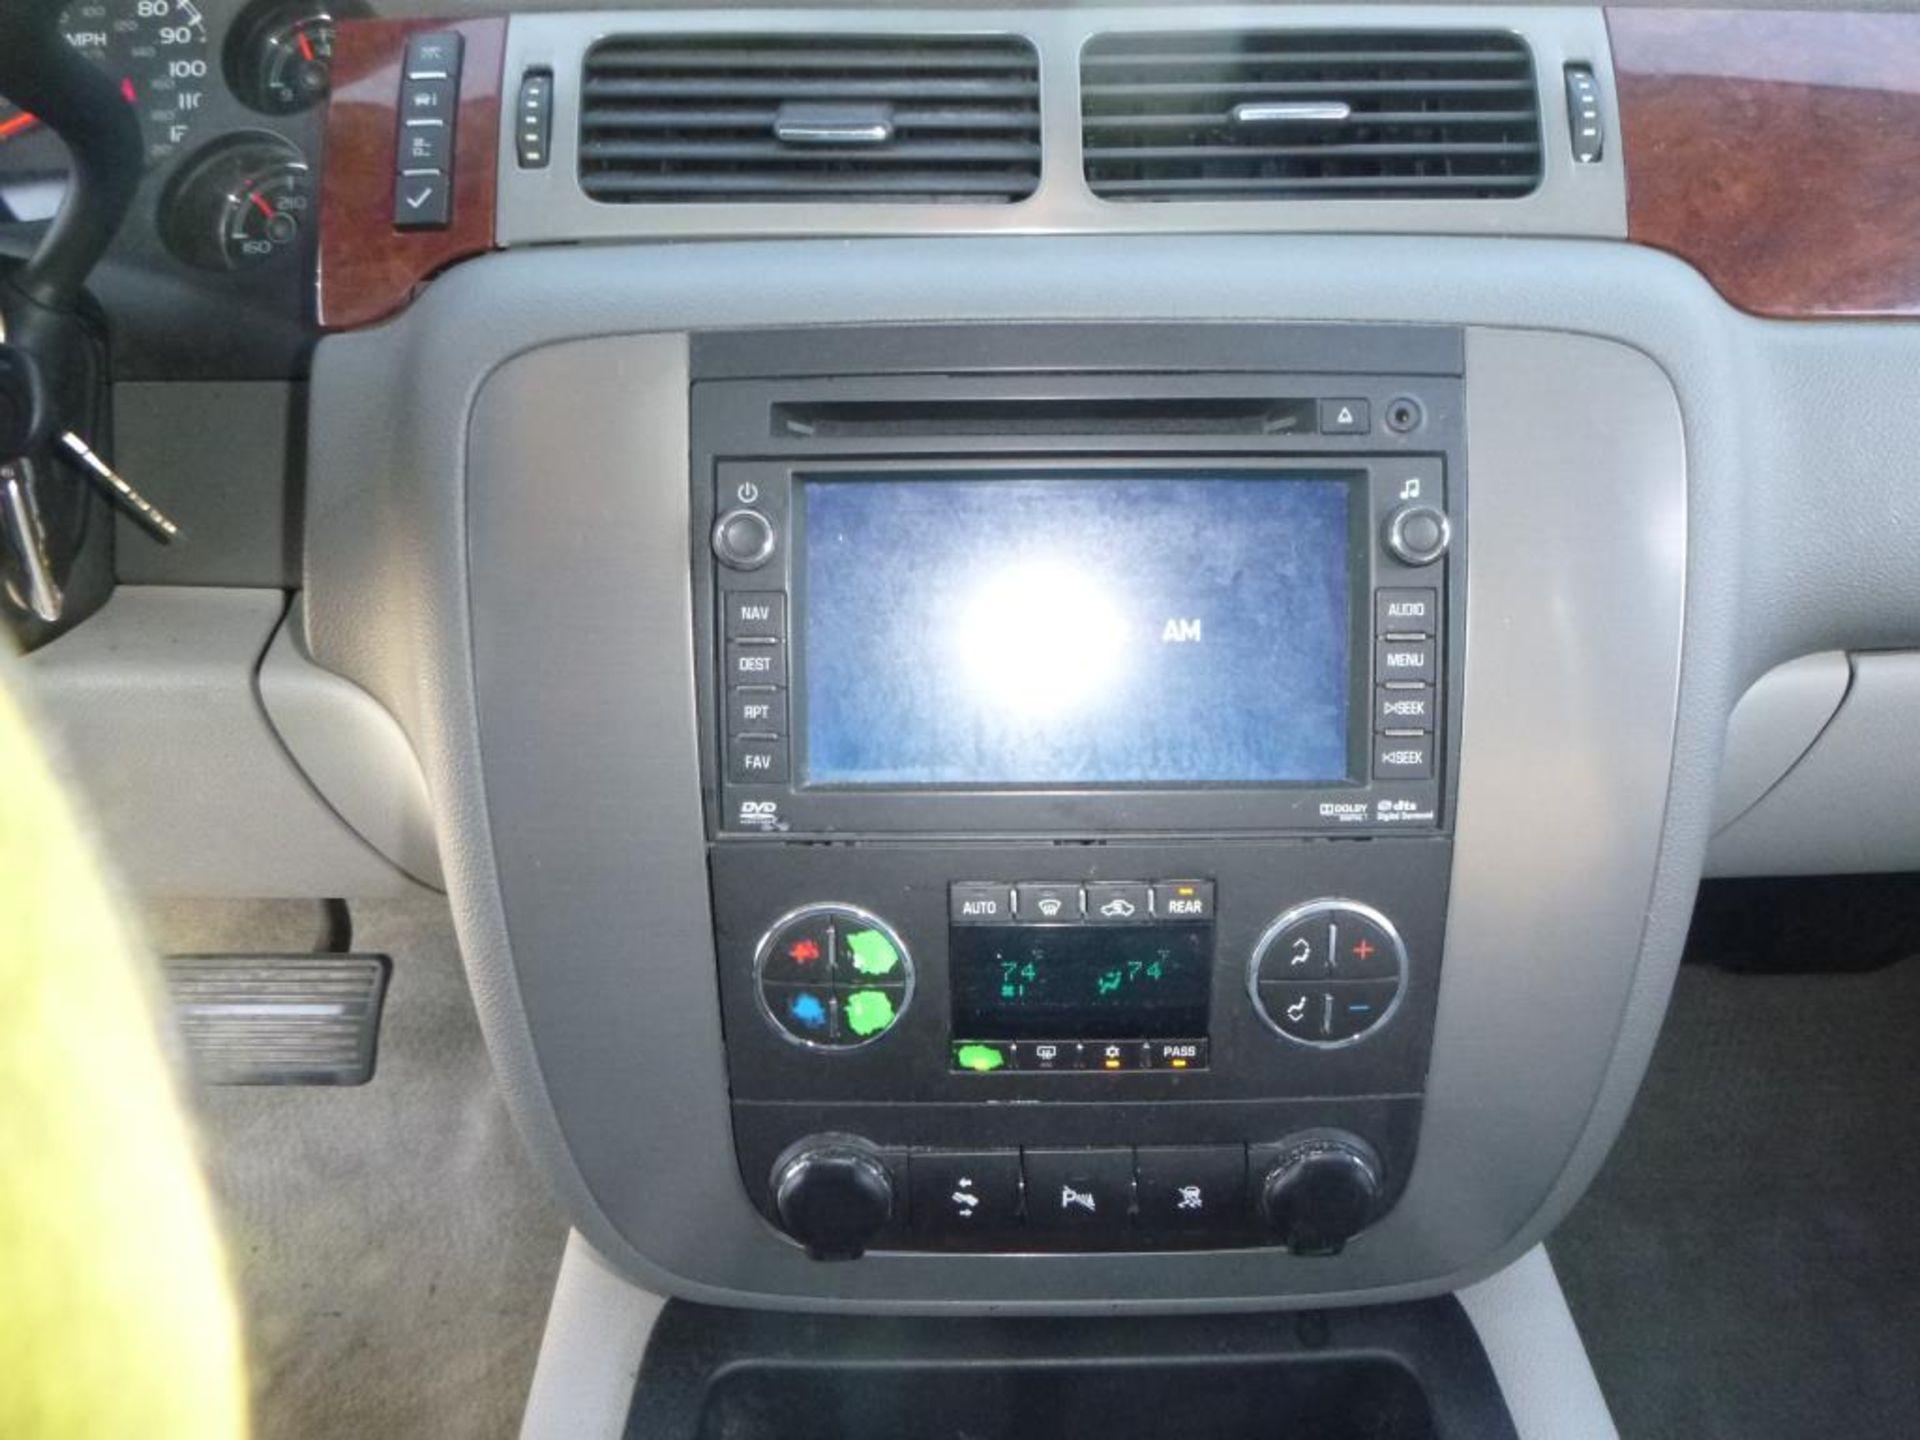 2010 GMC Yukon - Image 14 of 14